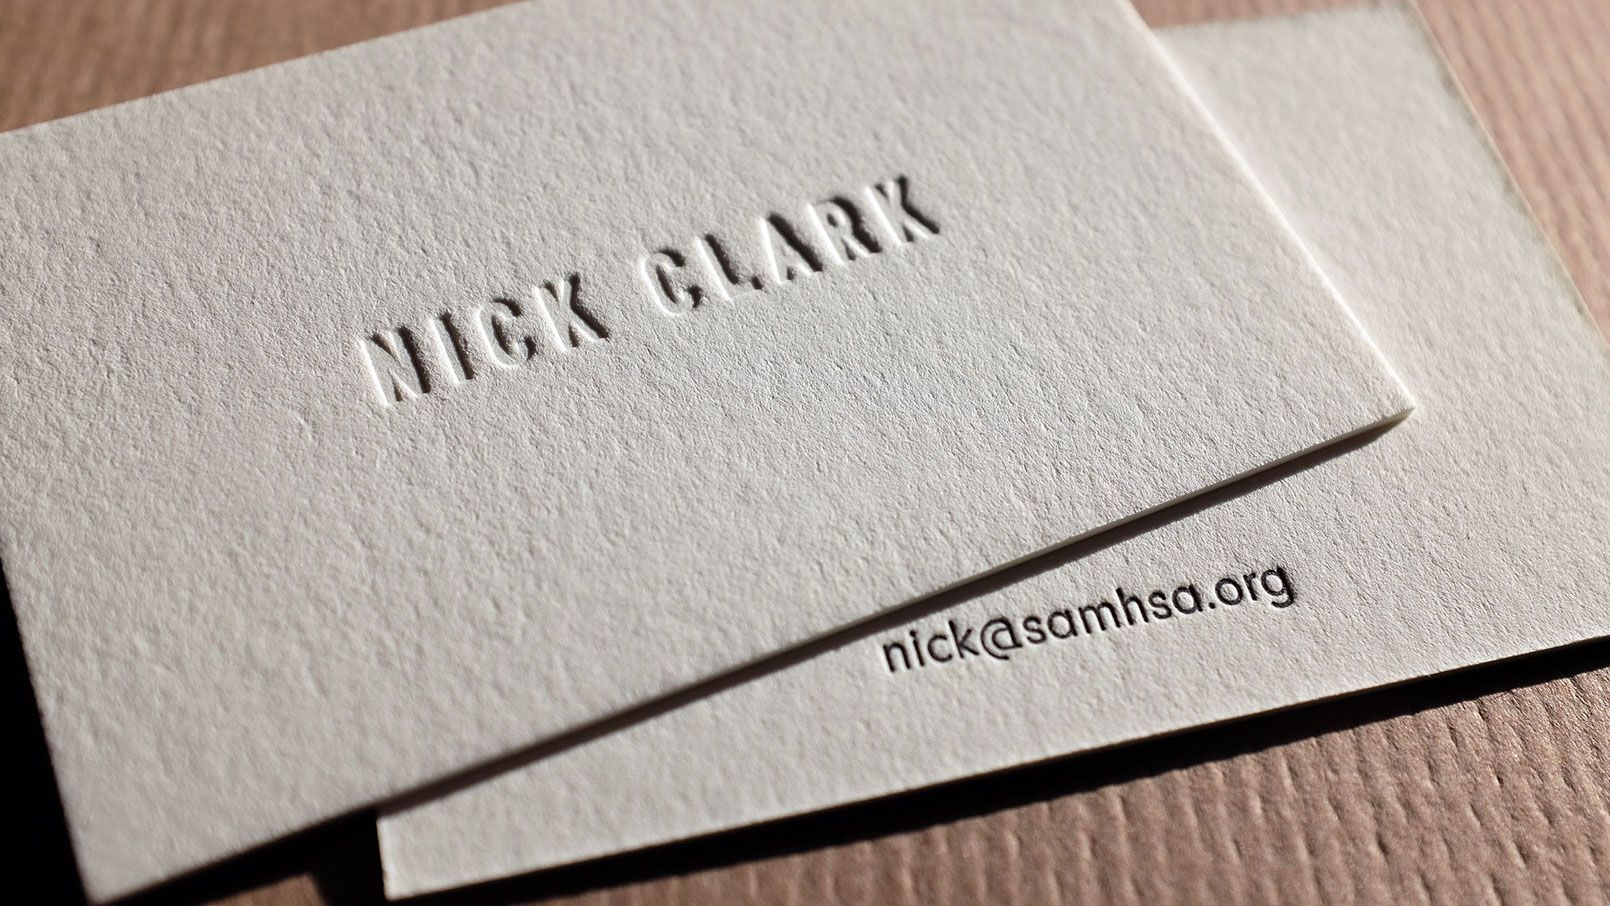 Hoban Cards Logos   Design: Business Cards   Pinterest   Business ...